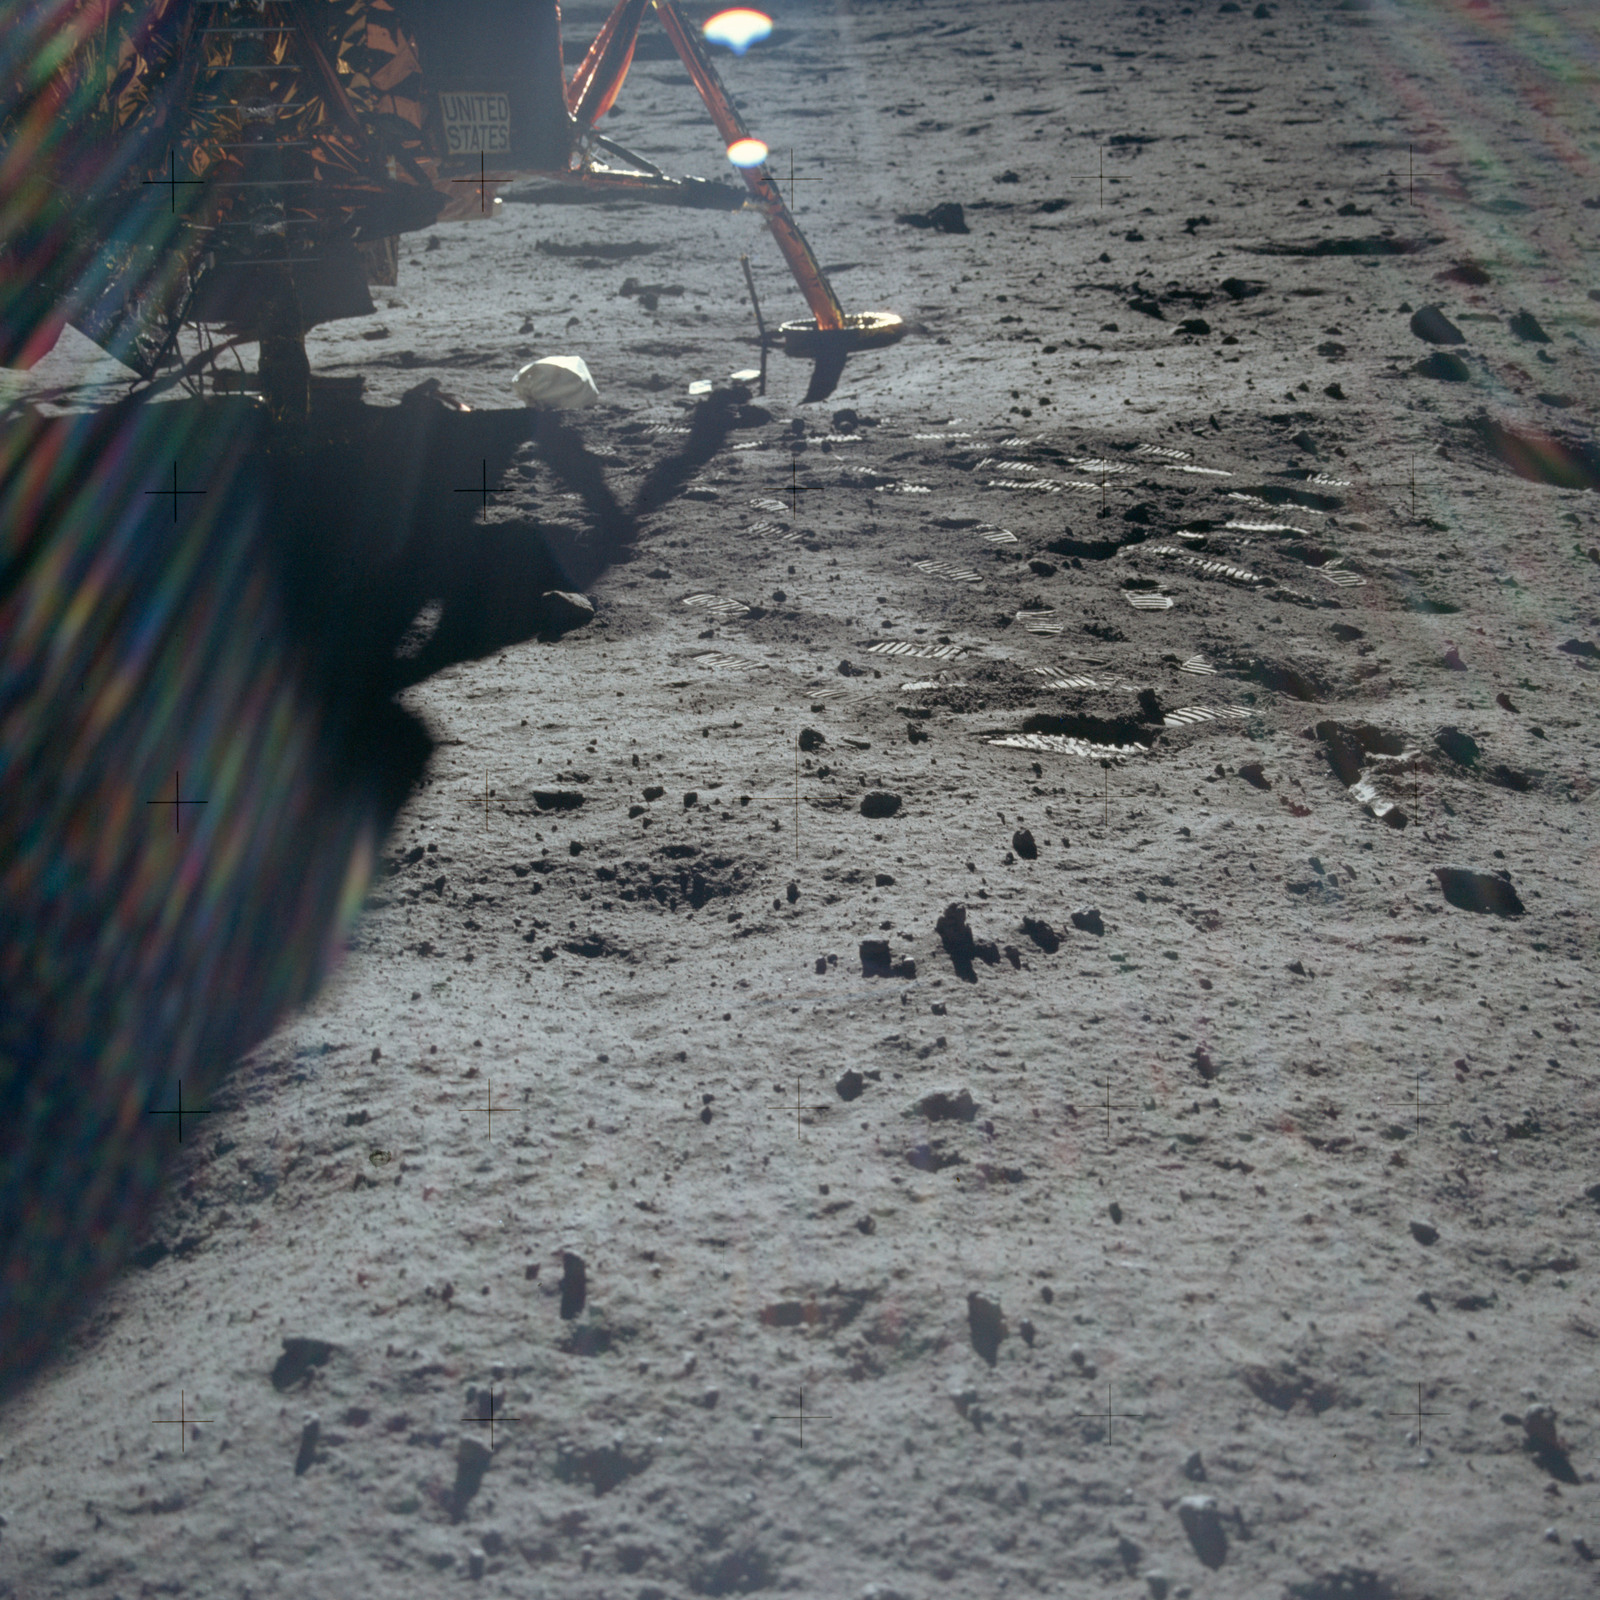 AS11-40-5887 - Apollo 11 - Apollo 11 Mission image -  Lunar surface near the  Lunar Module